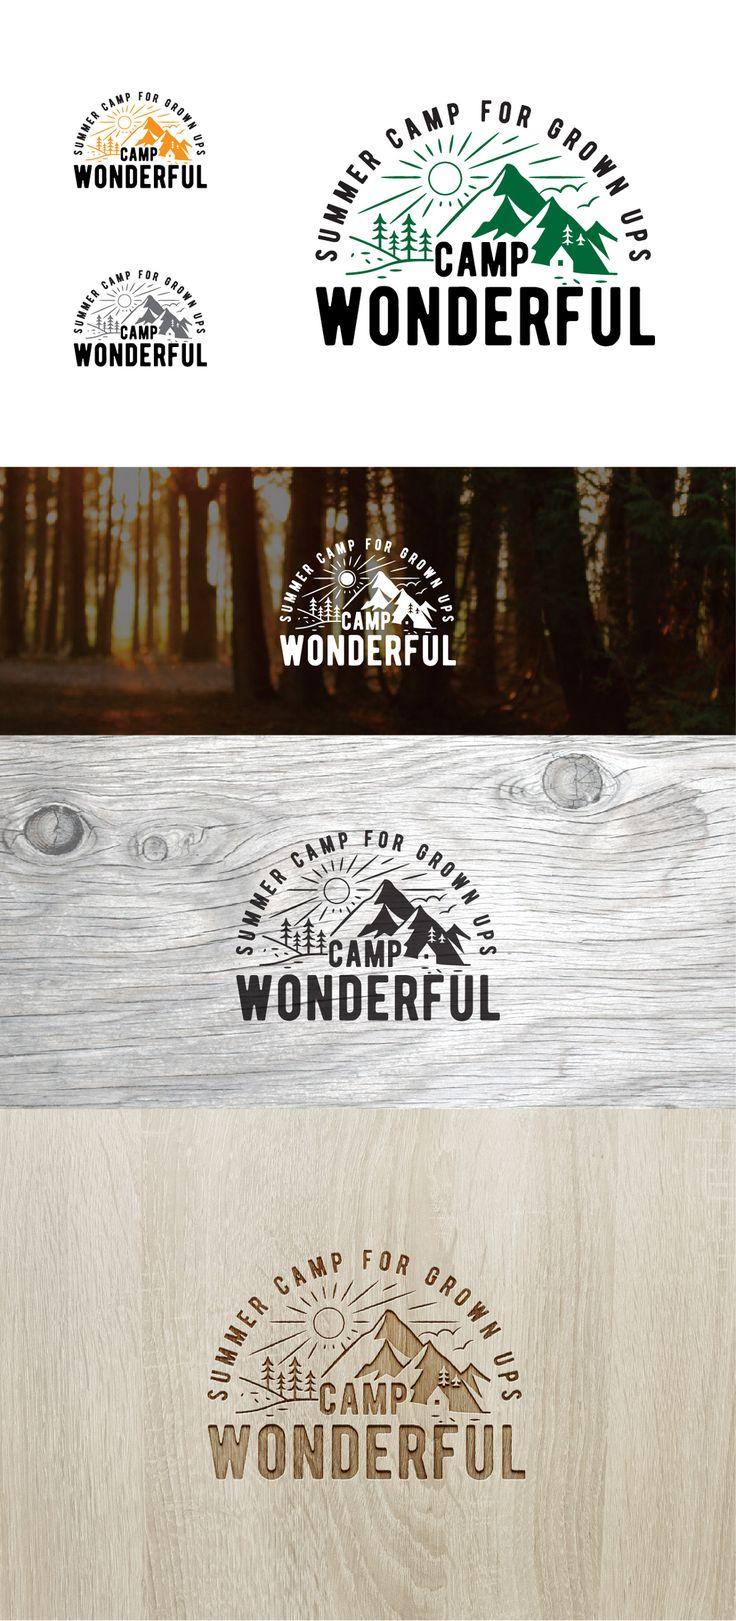 Messages | Camp Wonderful, Summer Camp for Grown Ups | Logo design contest